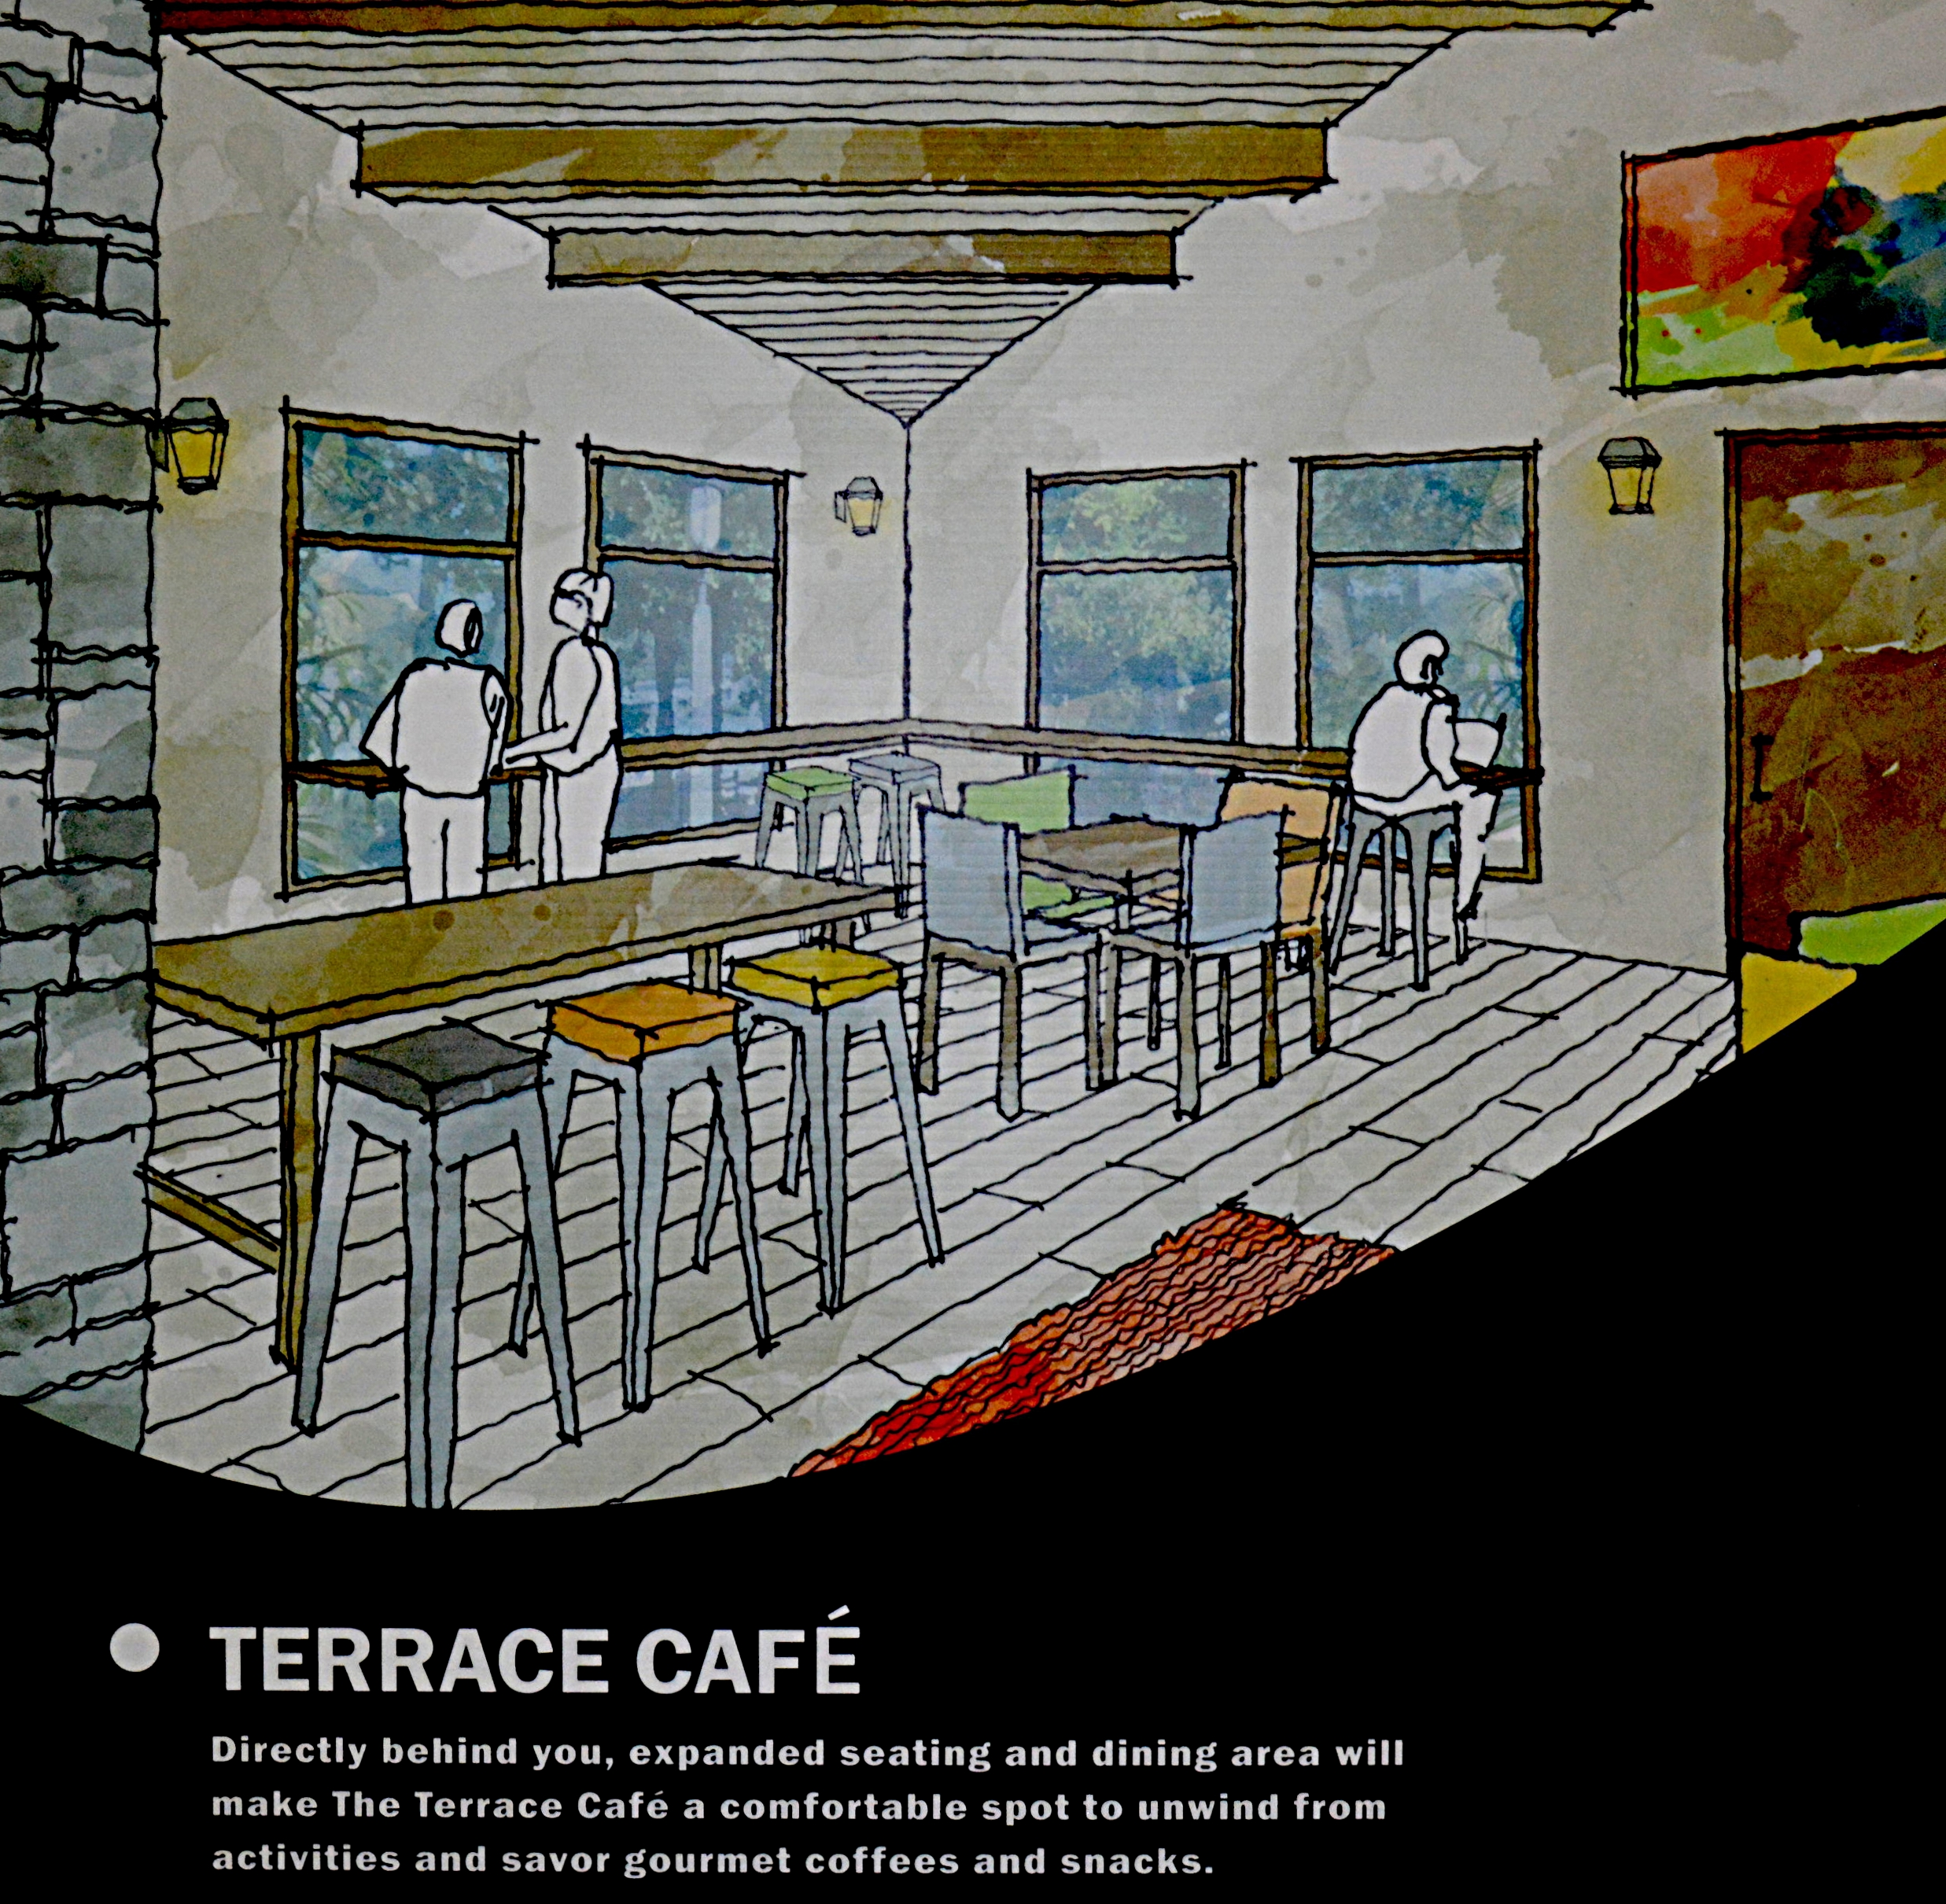 terrace cafe 2.JPG